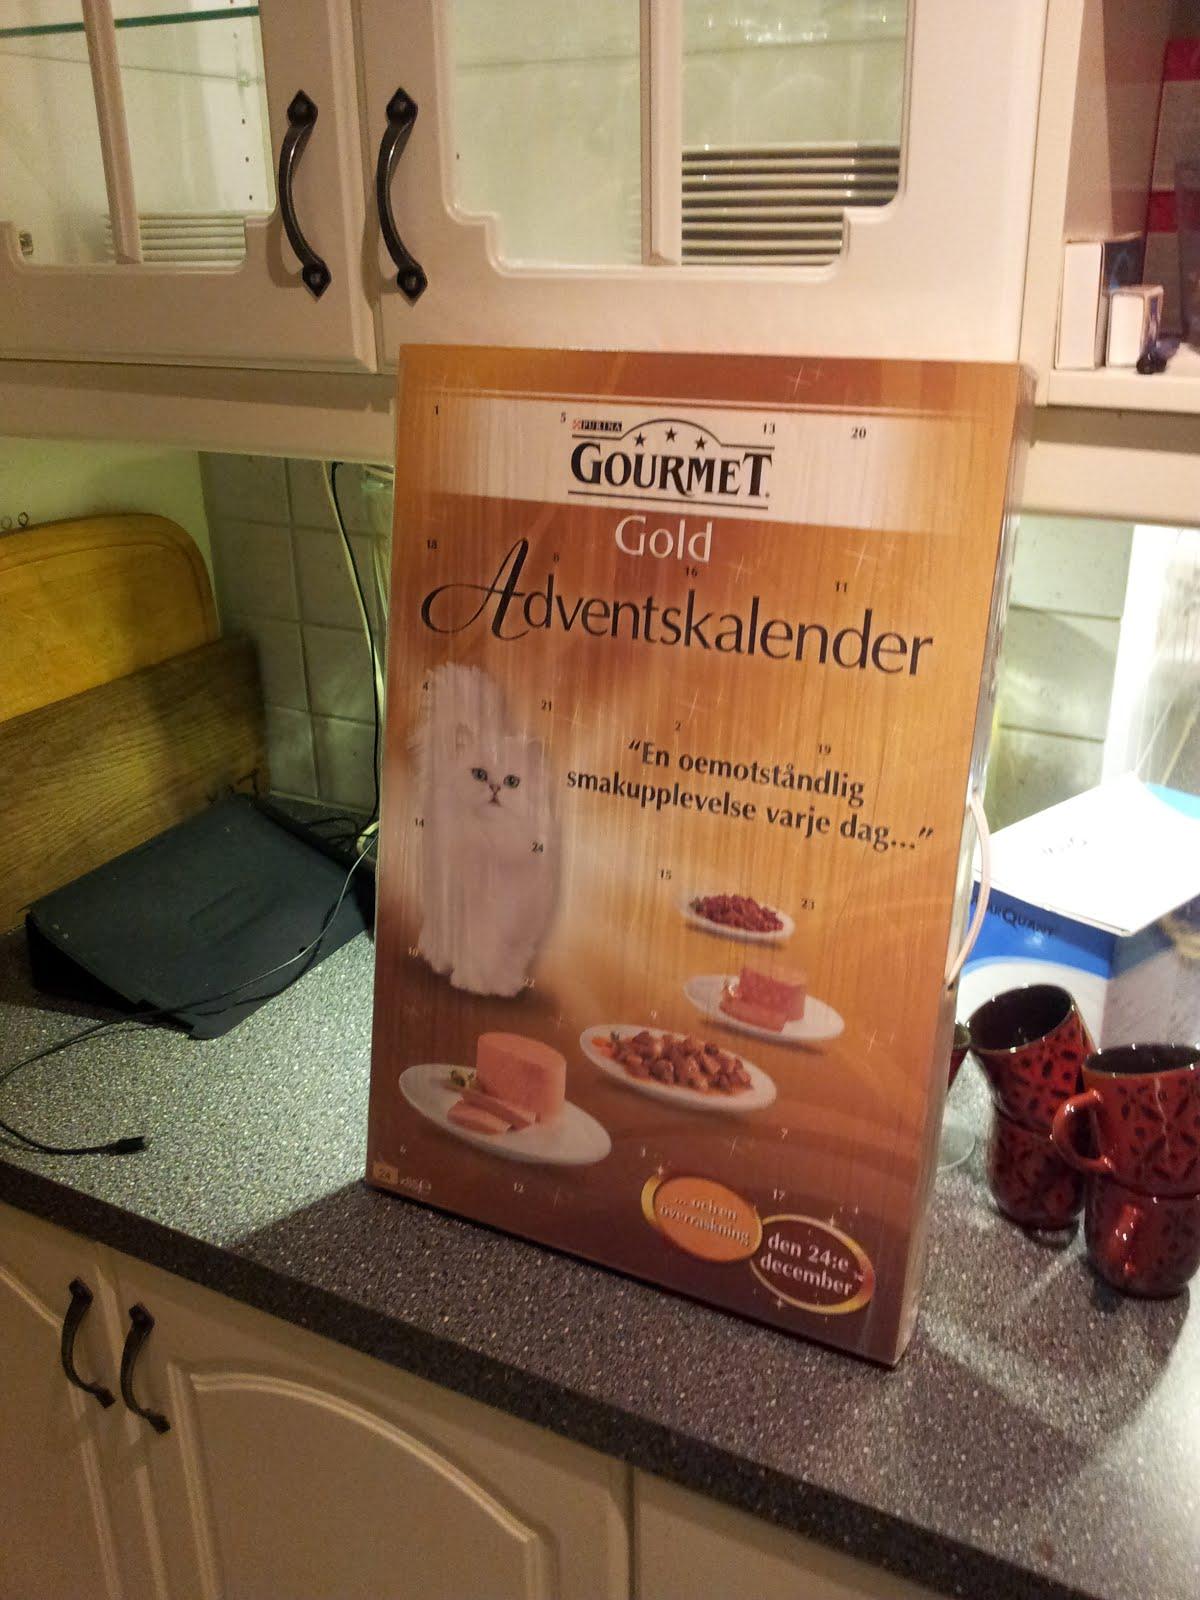 Gourmets adventskalender